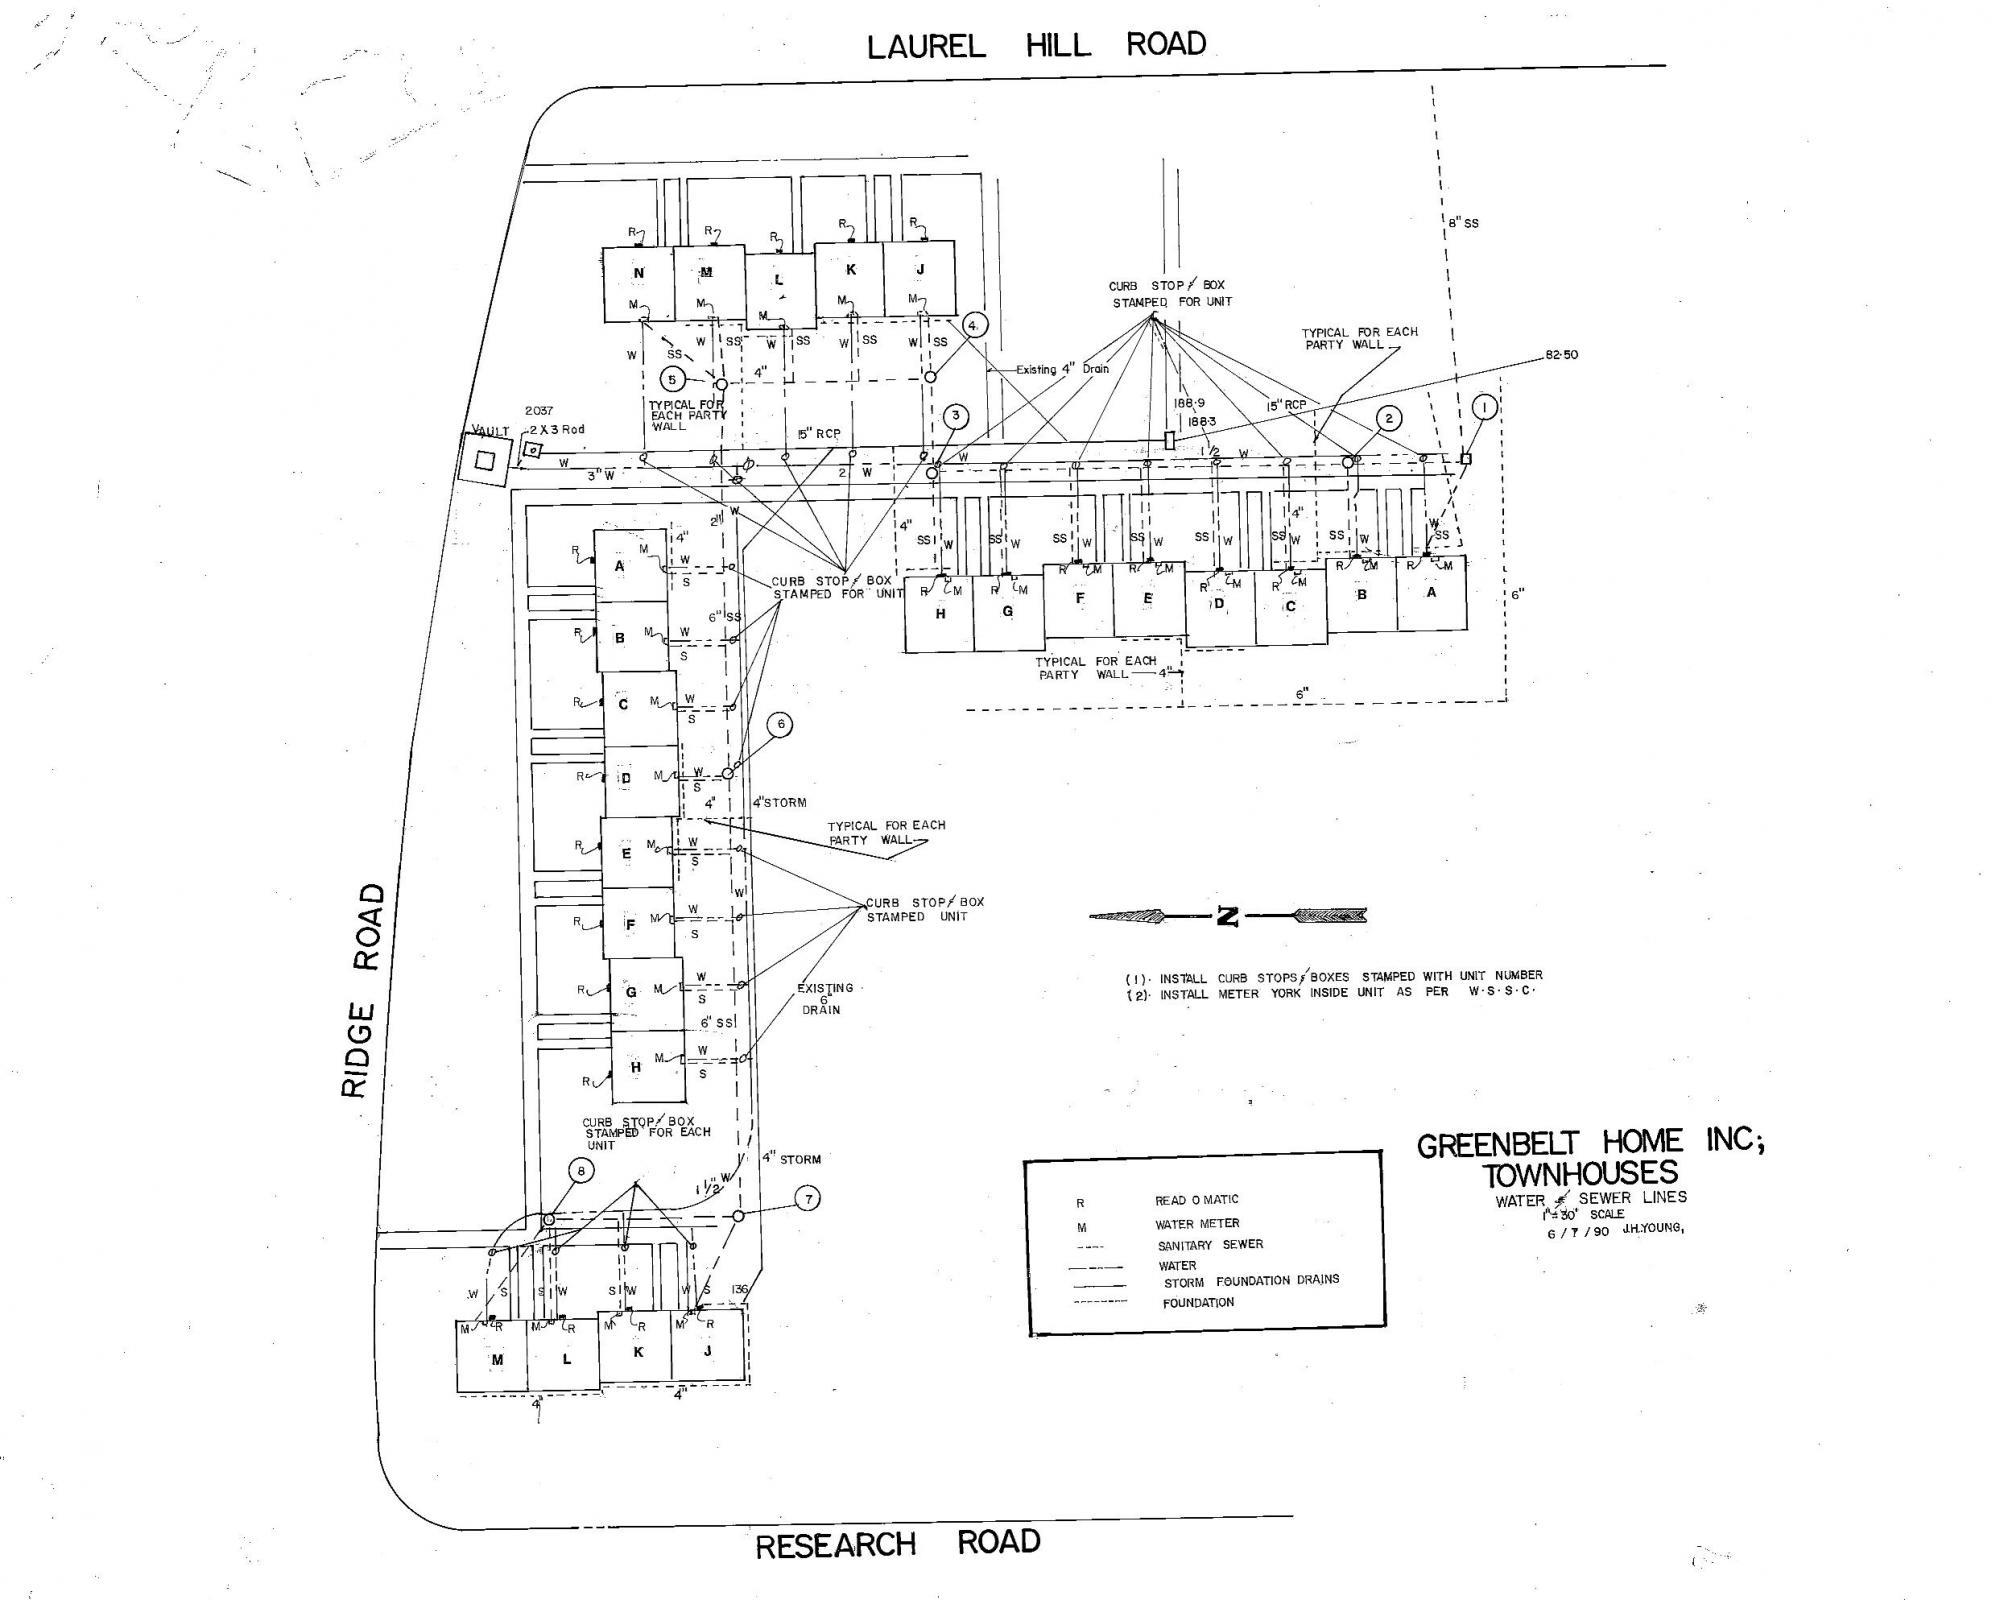 GHI Underground Utilities: Water, Sewer, Storm